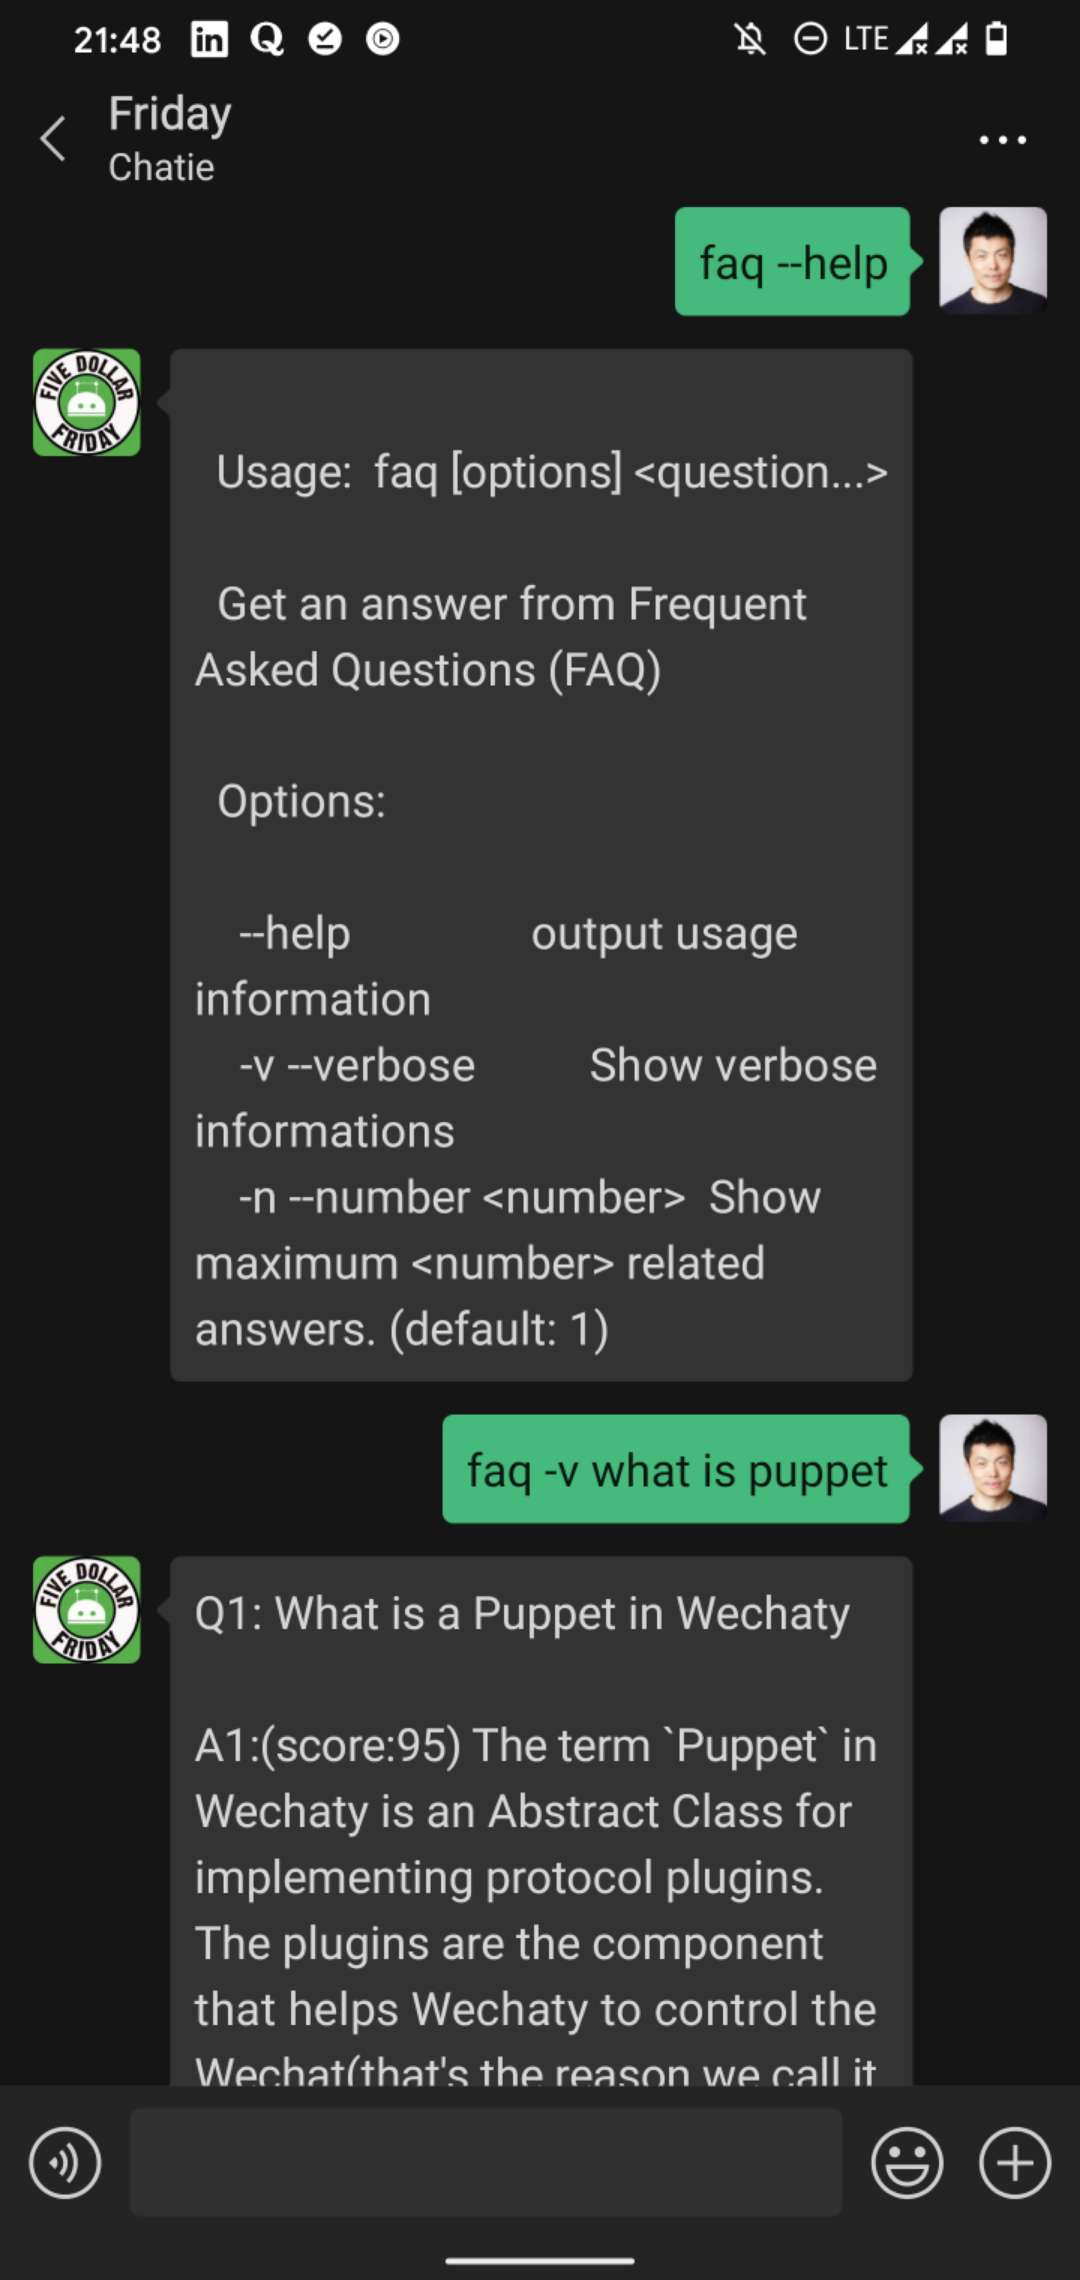 QnAMaker Wechaty Vorpal FAQ Command